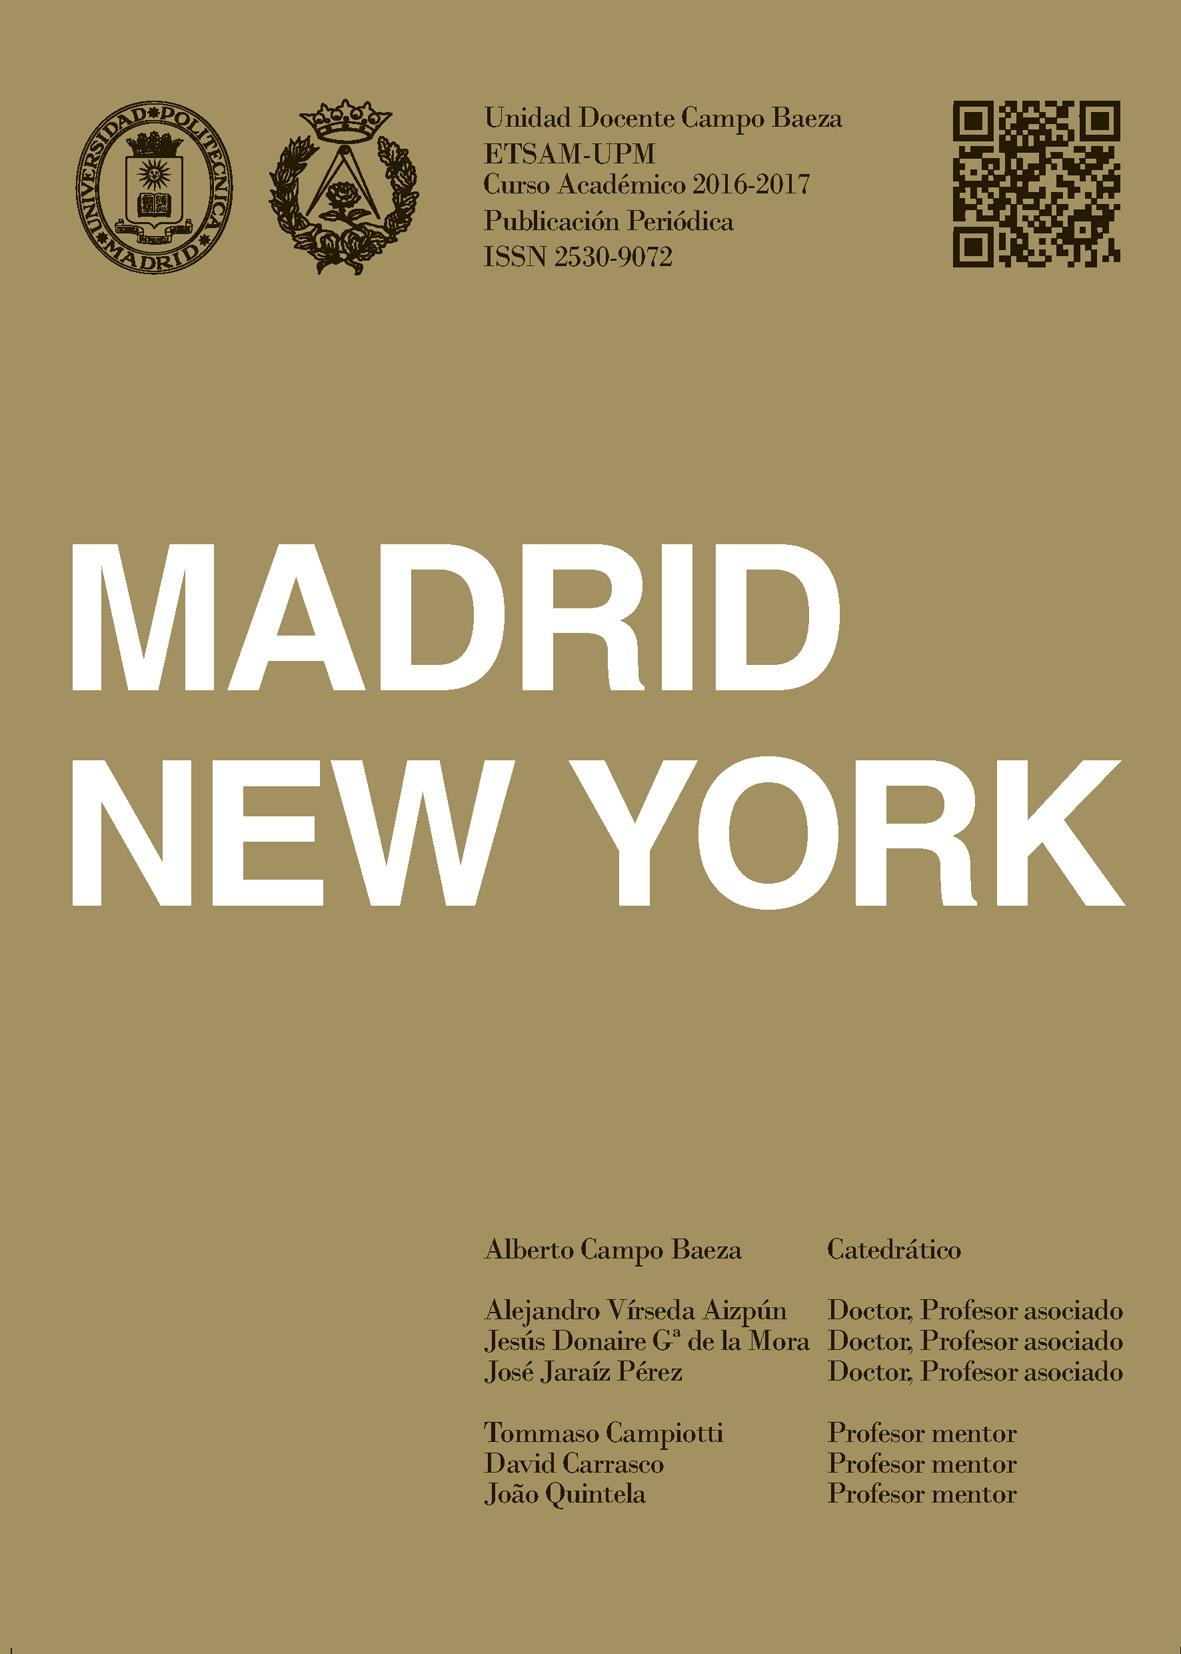 2016-17 UDCB Madrid - New York - 00_portada.jpg